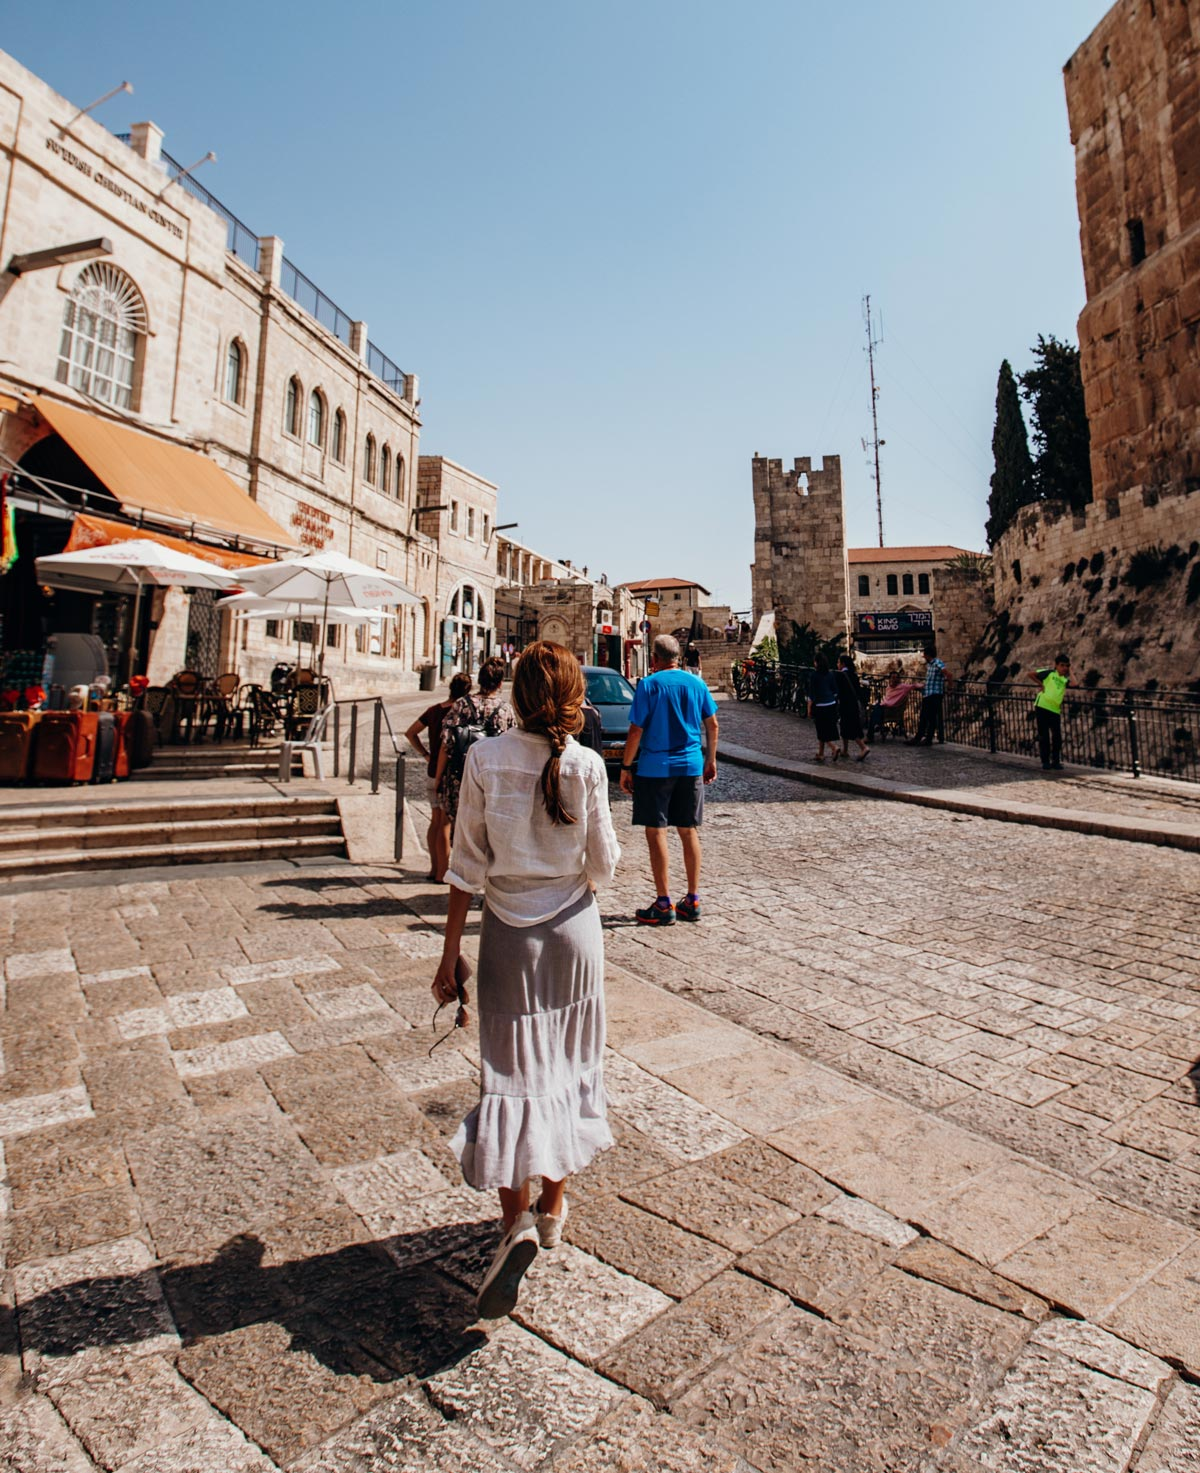 israel-jerusalem-streets-old-town